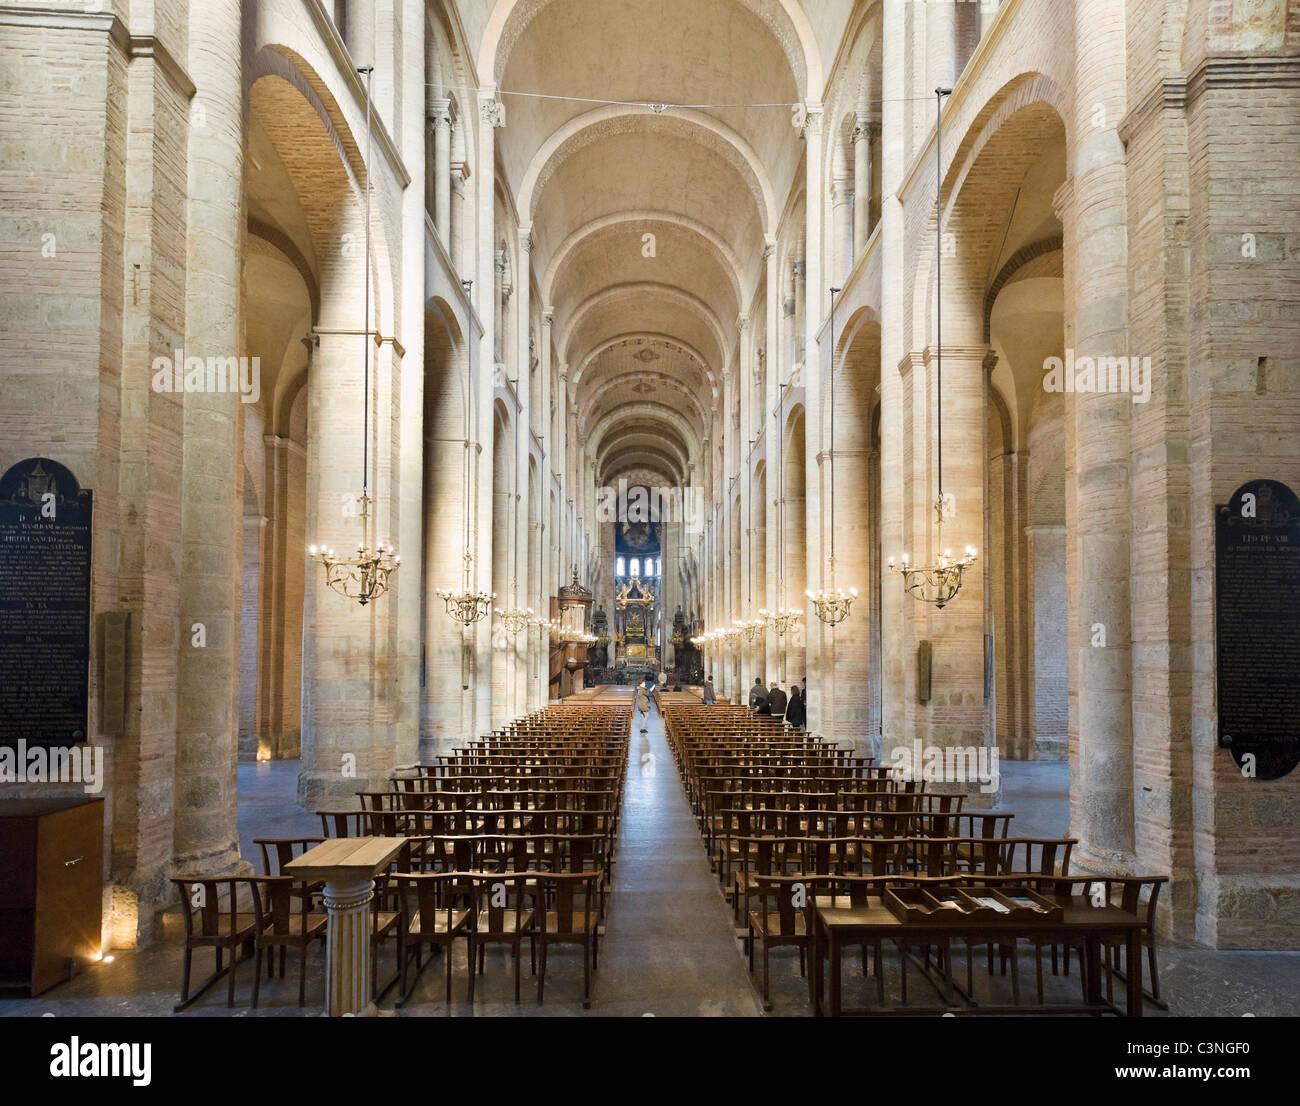 Interior of the 12thC Romanesque Basilica de St Sernin ...